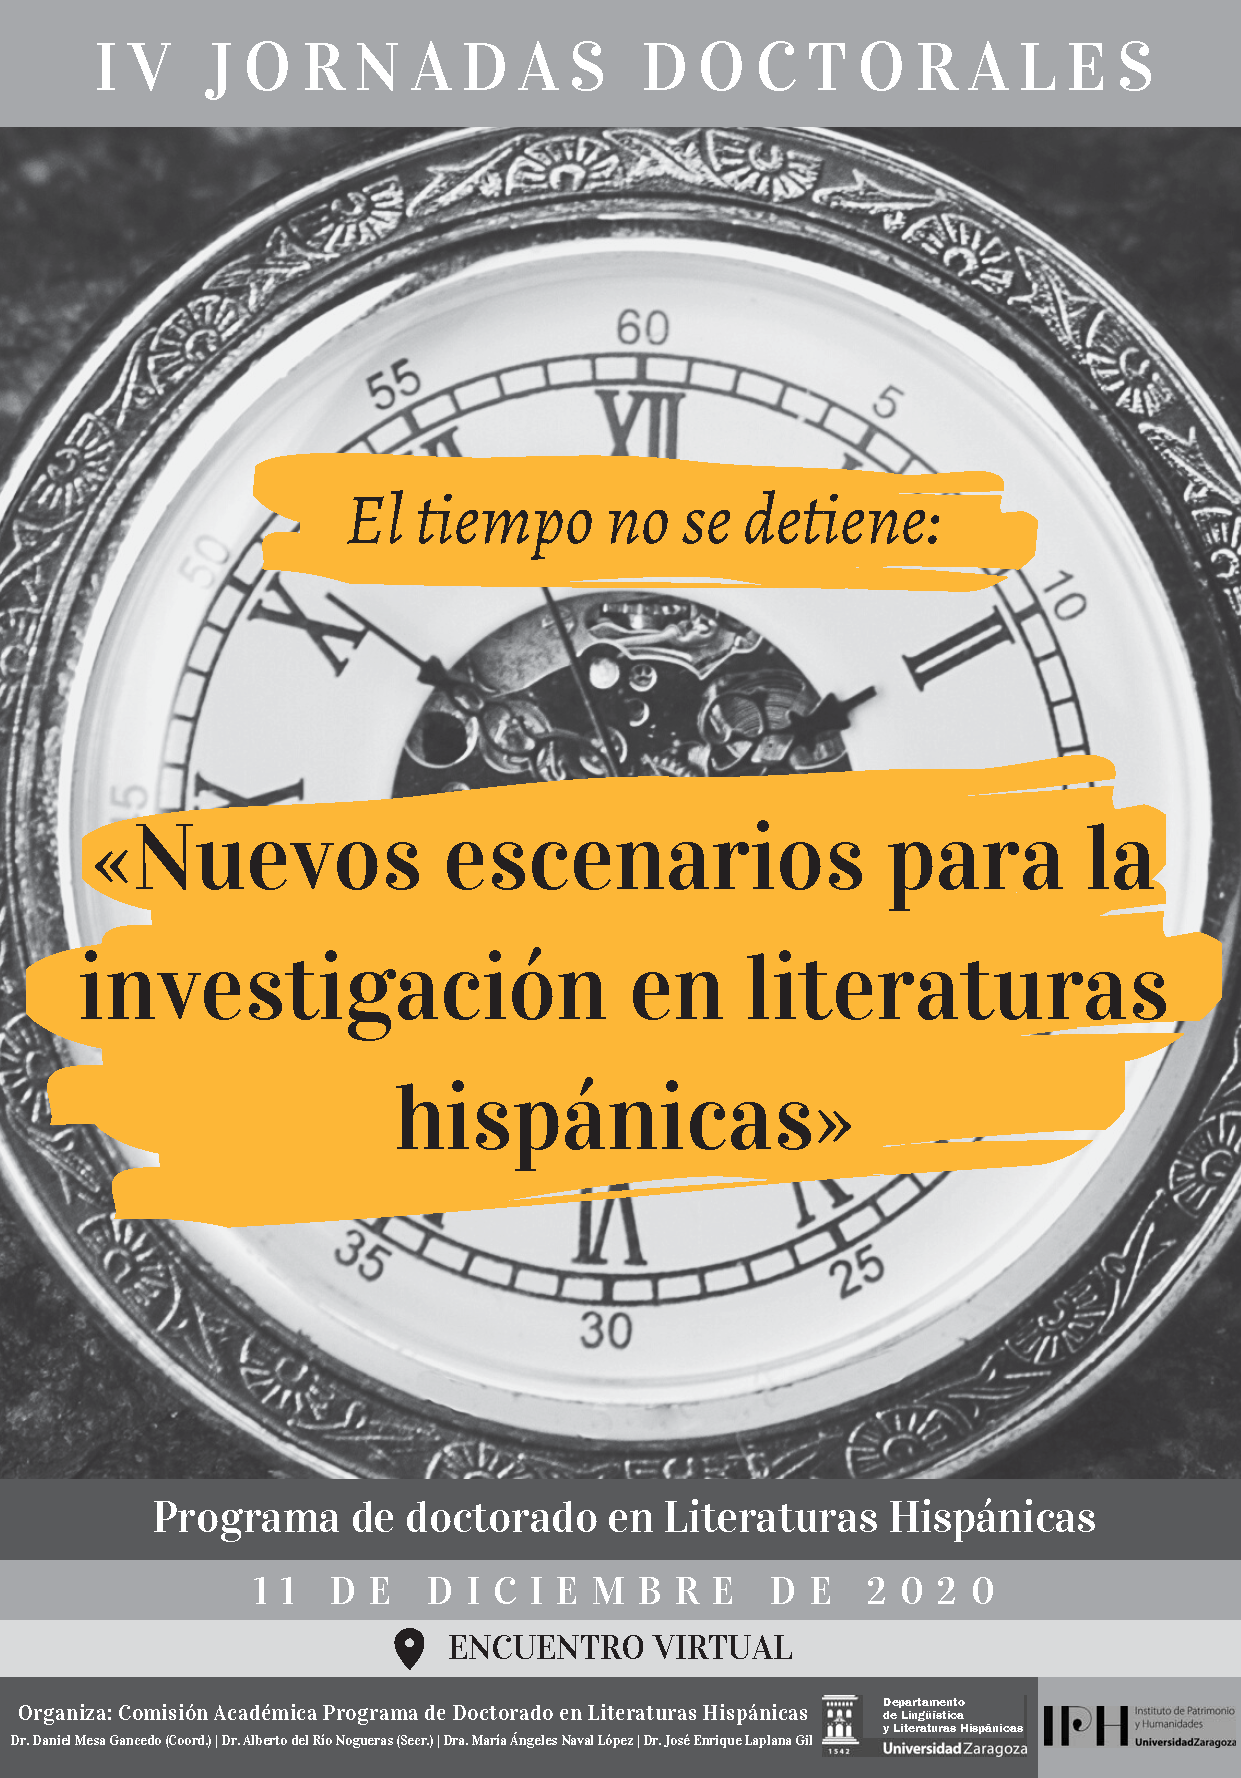 IV Jornadas Doctorales_Literaturas Hispánicas_Cartel